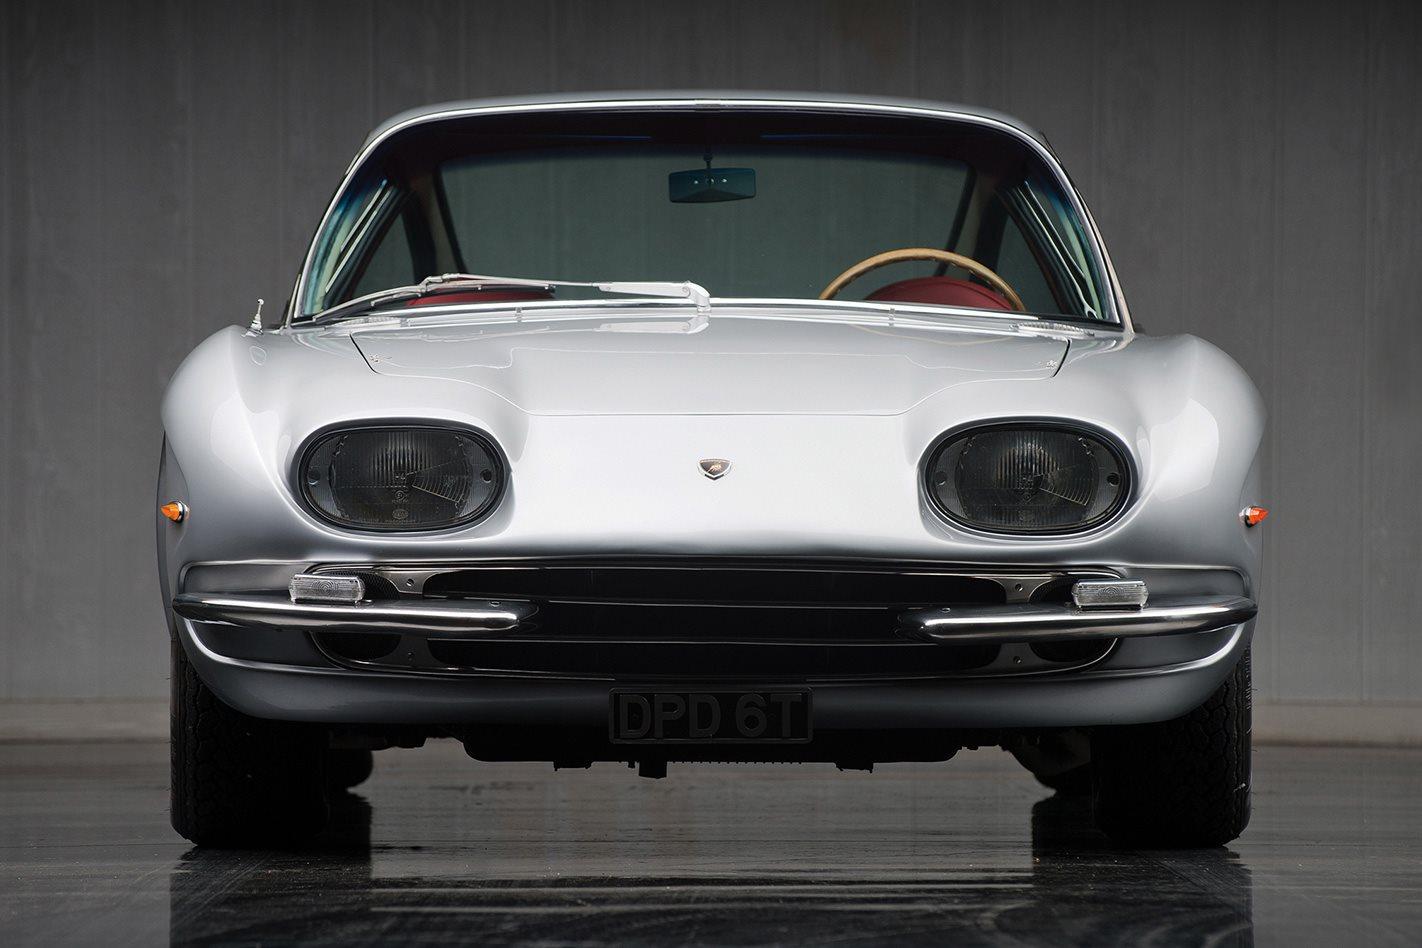 Lamborghini s Top 10 Most Intriguing Cars 8c361bf49081